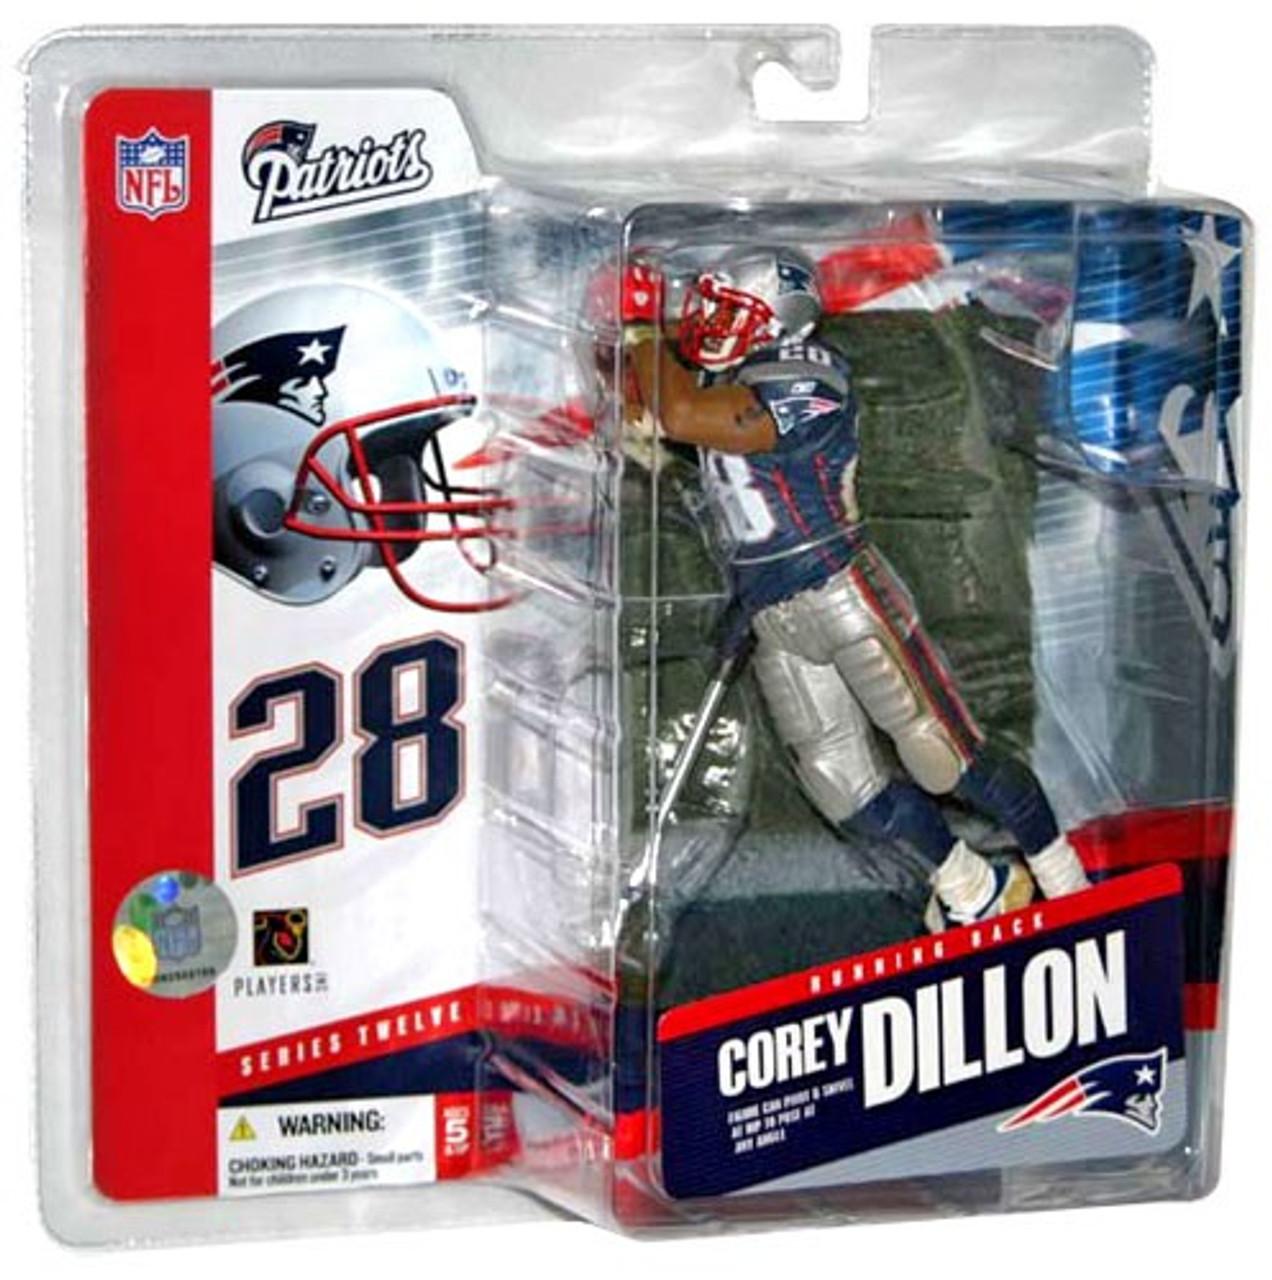 McFarlane Toys NFL New England Patriots Sports Picks Series 12 Corey Dillon Action Figure